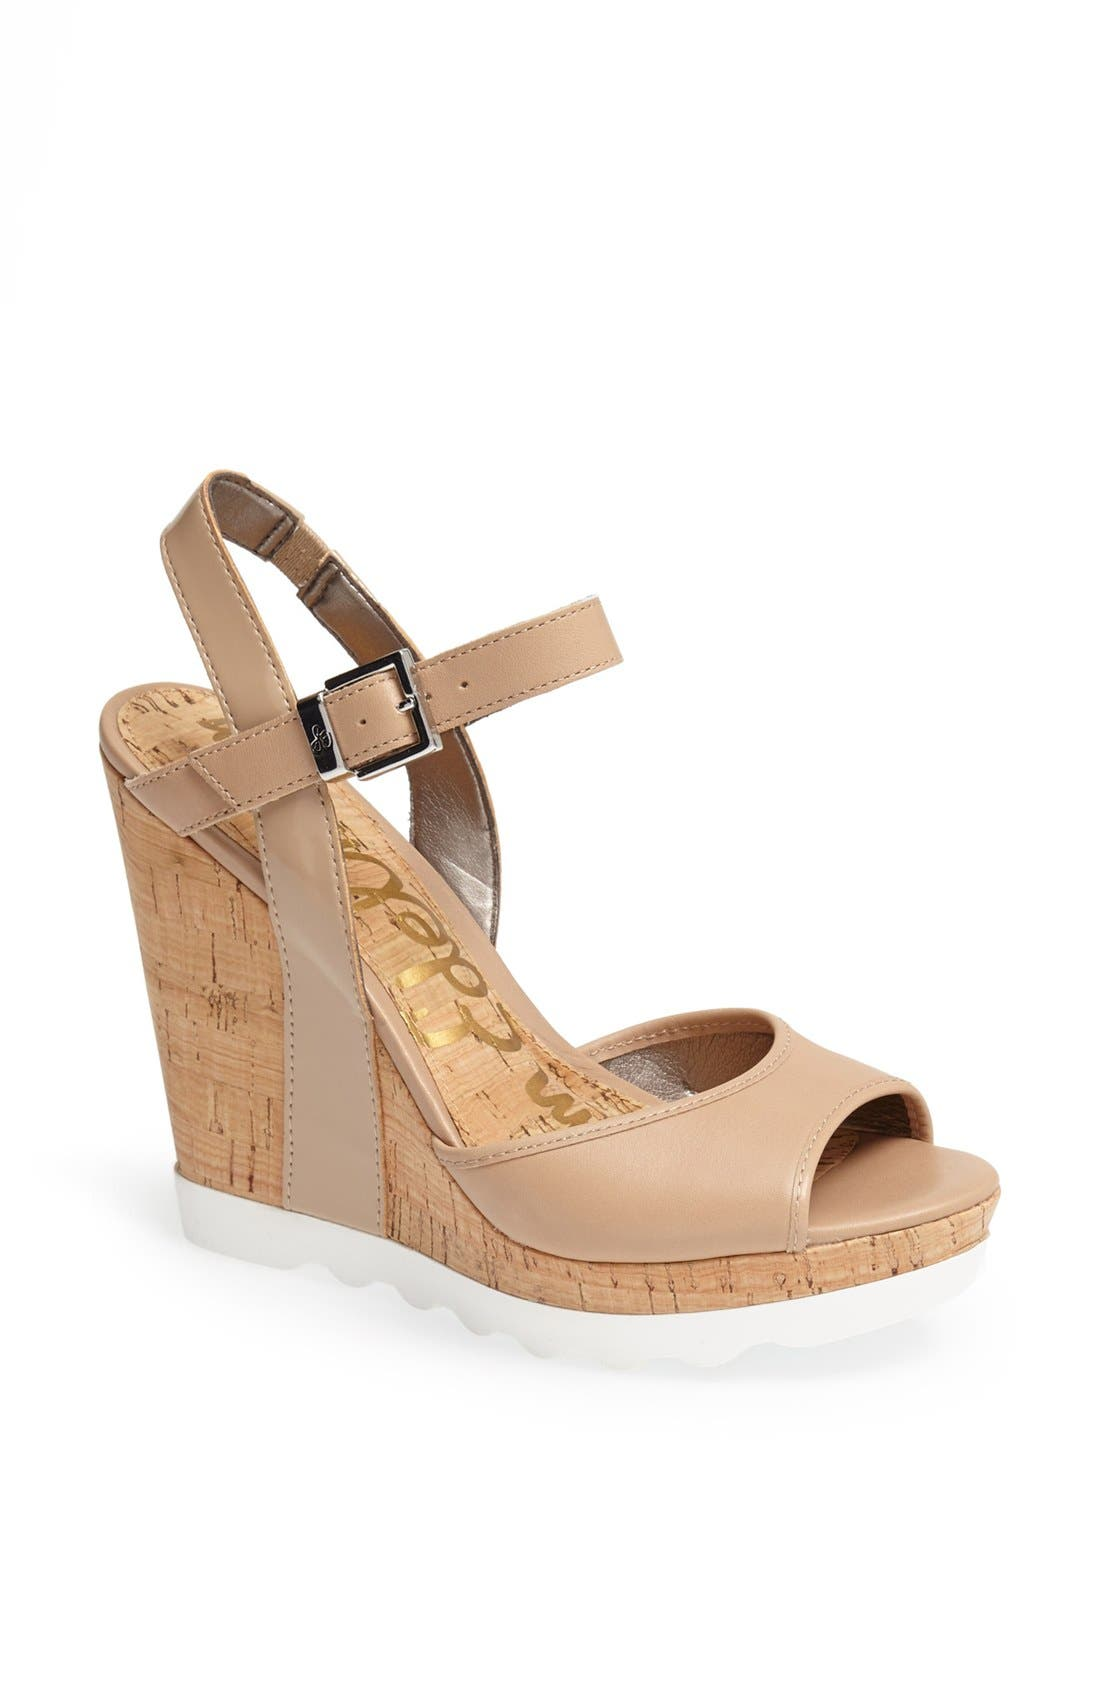 Alternate Image 1 Selected - Sam Edelman 'Karina' Wedge Sandal